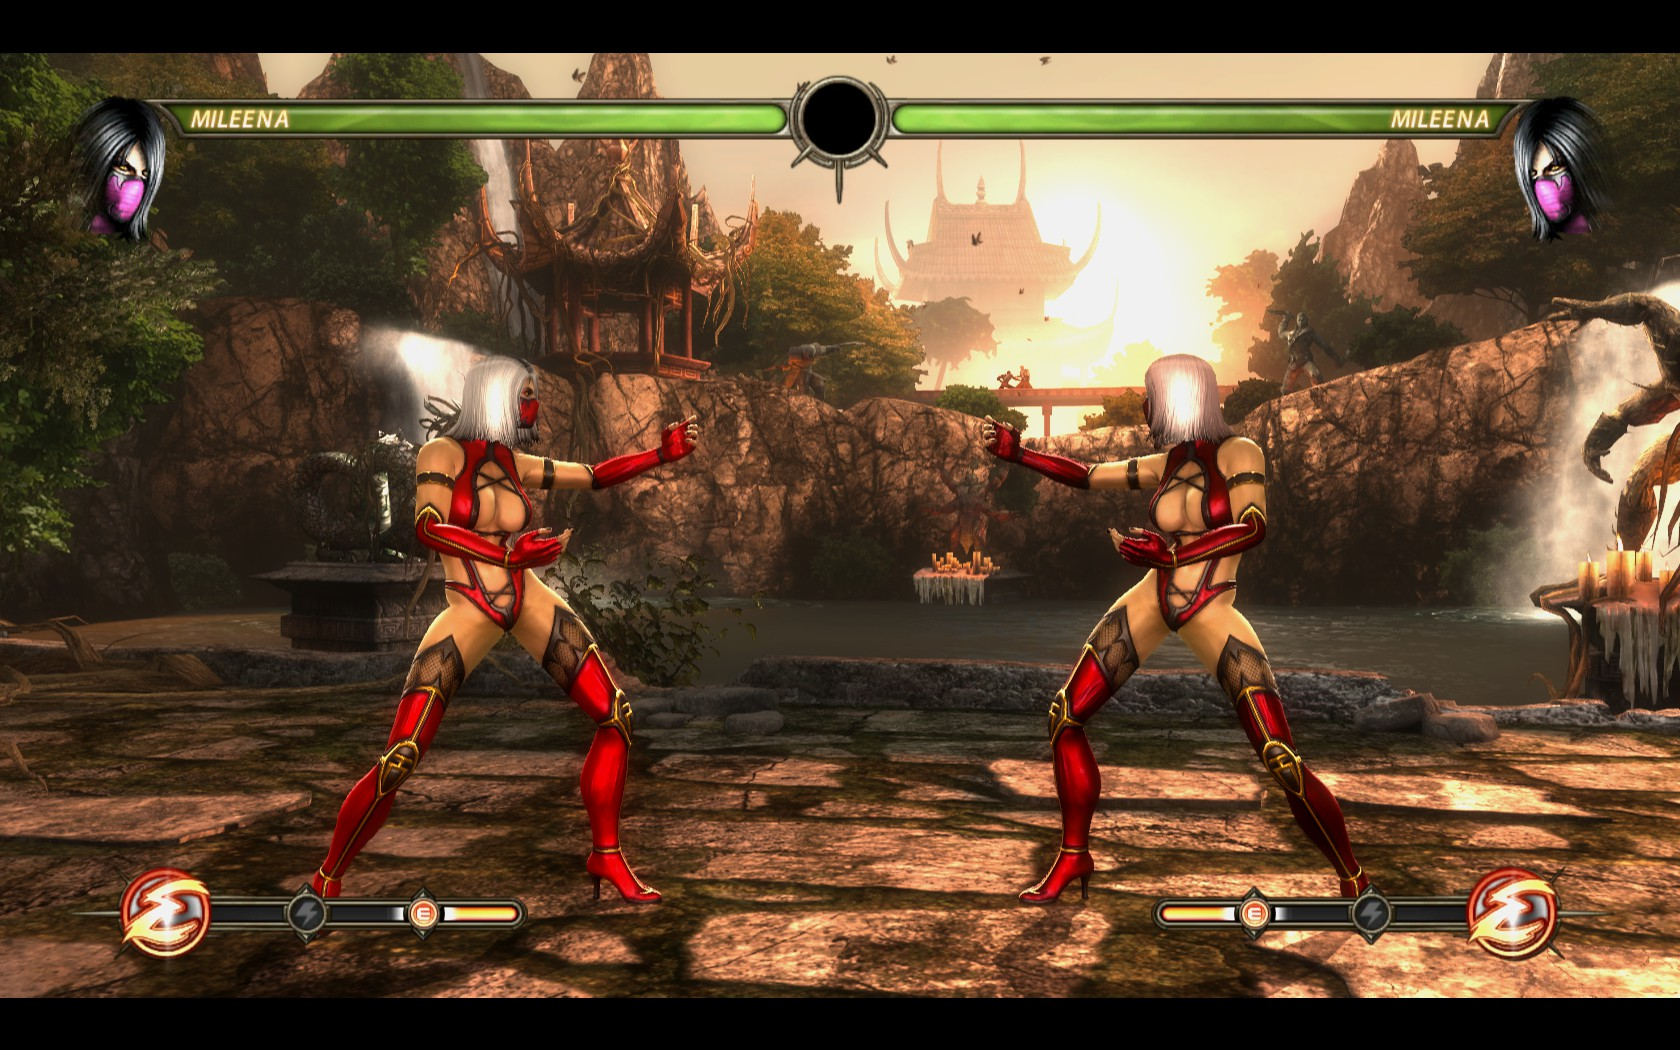 Red&White Mileena • Mortal Kombat Secrets